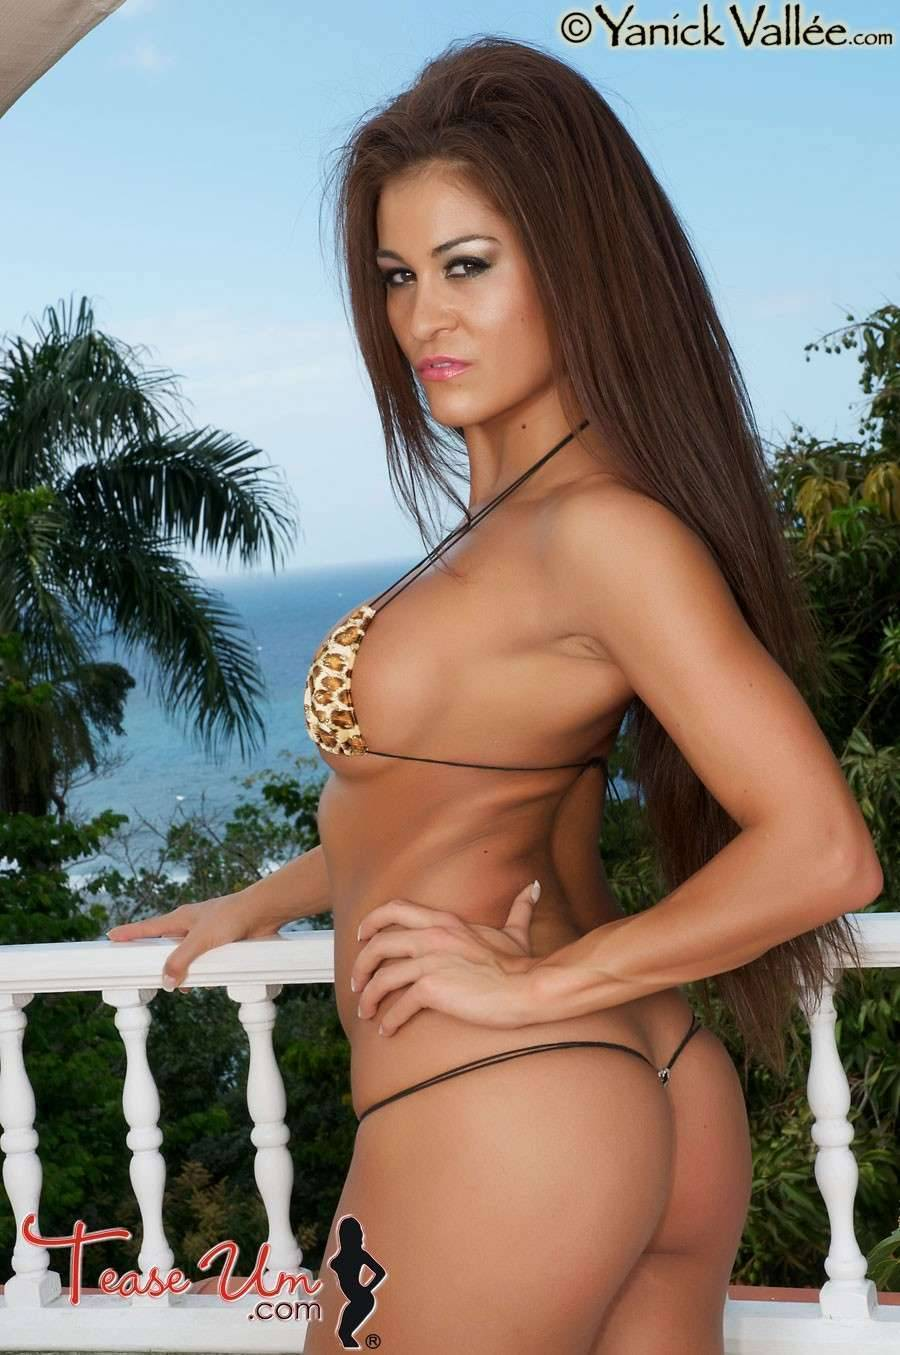 Zara Hawk looking wild in a leopard bikini top. thumb 2